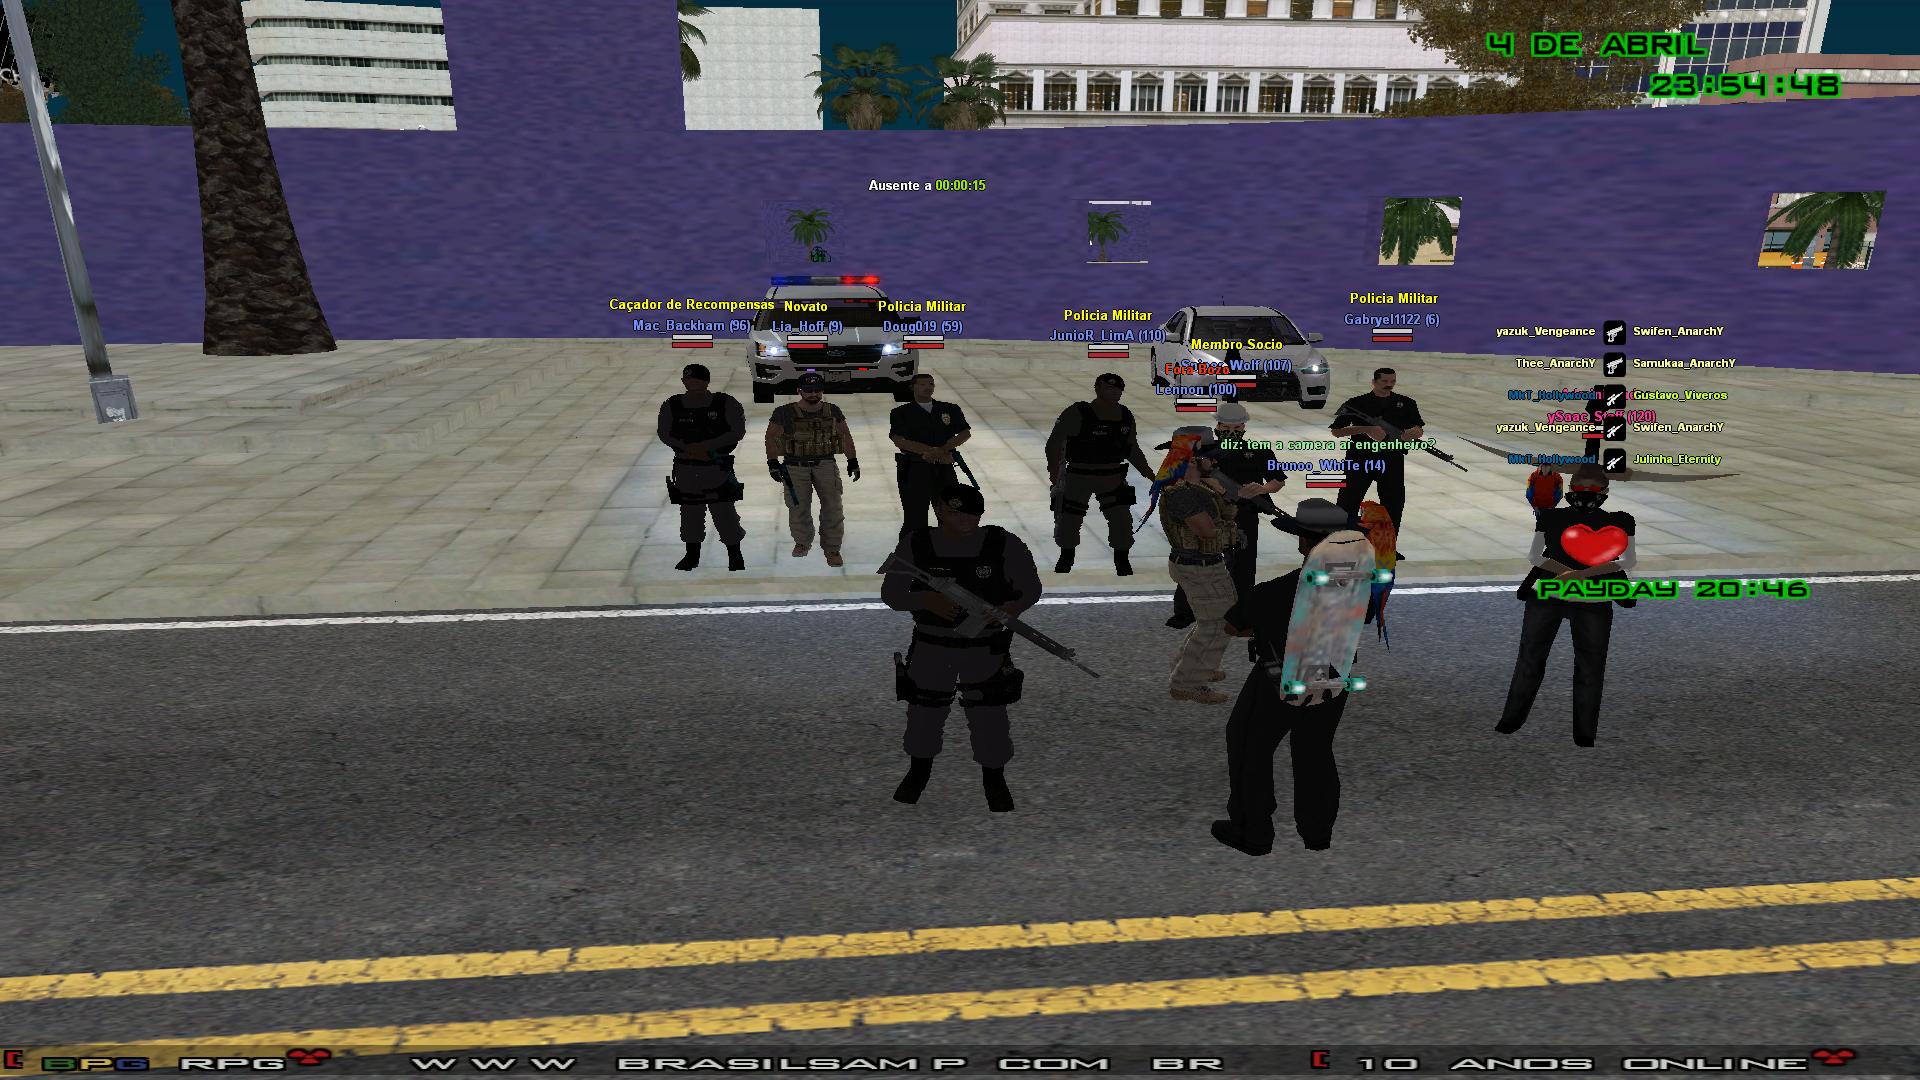 [04/04/2020]Policia Militar lider: Brunoo_WhiTe Sa-mp-015